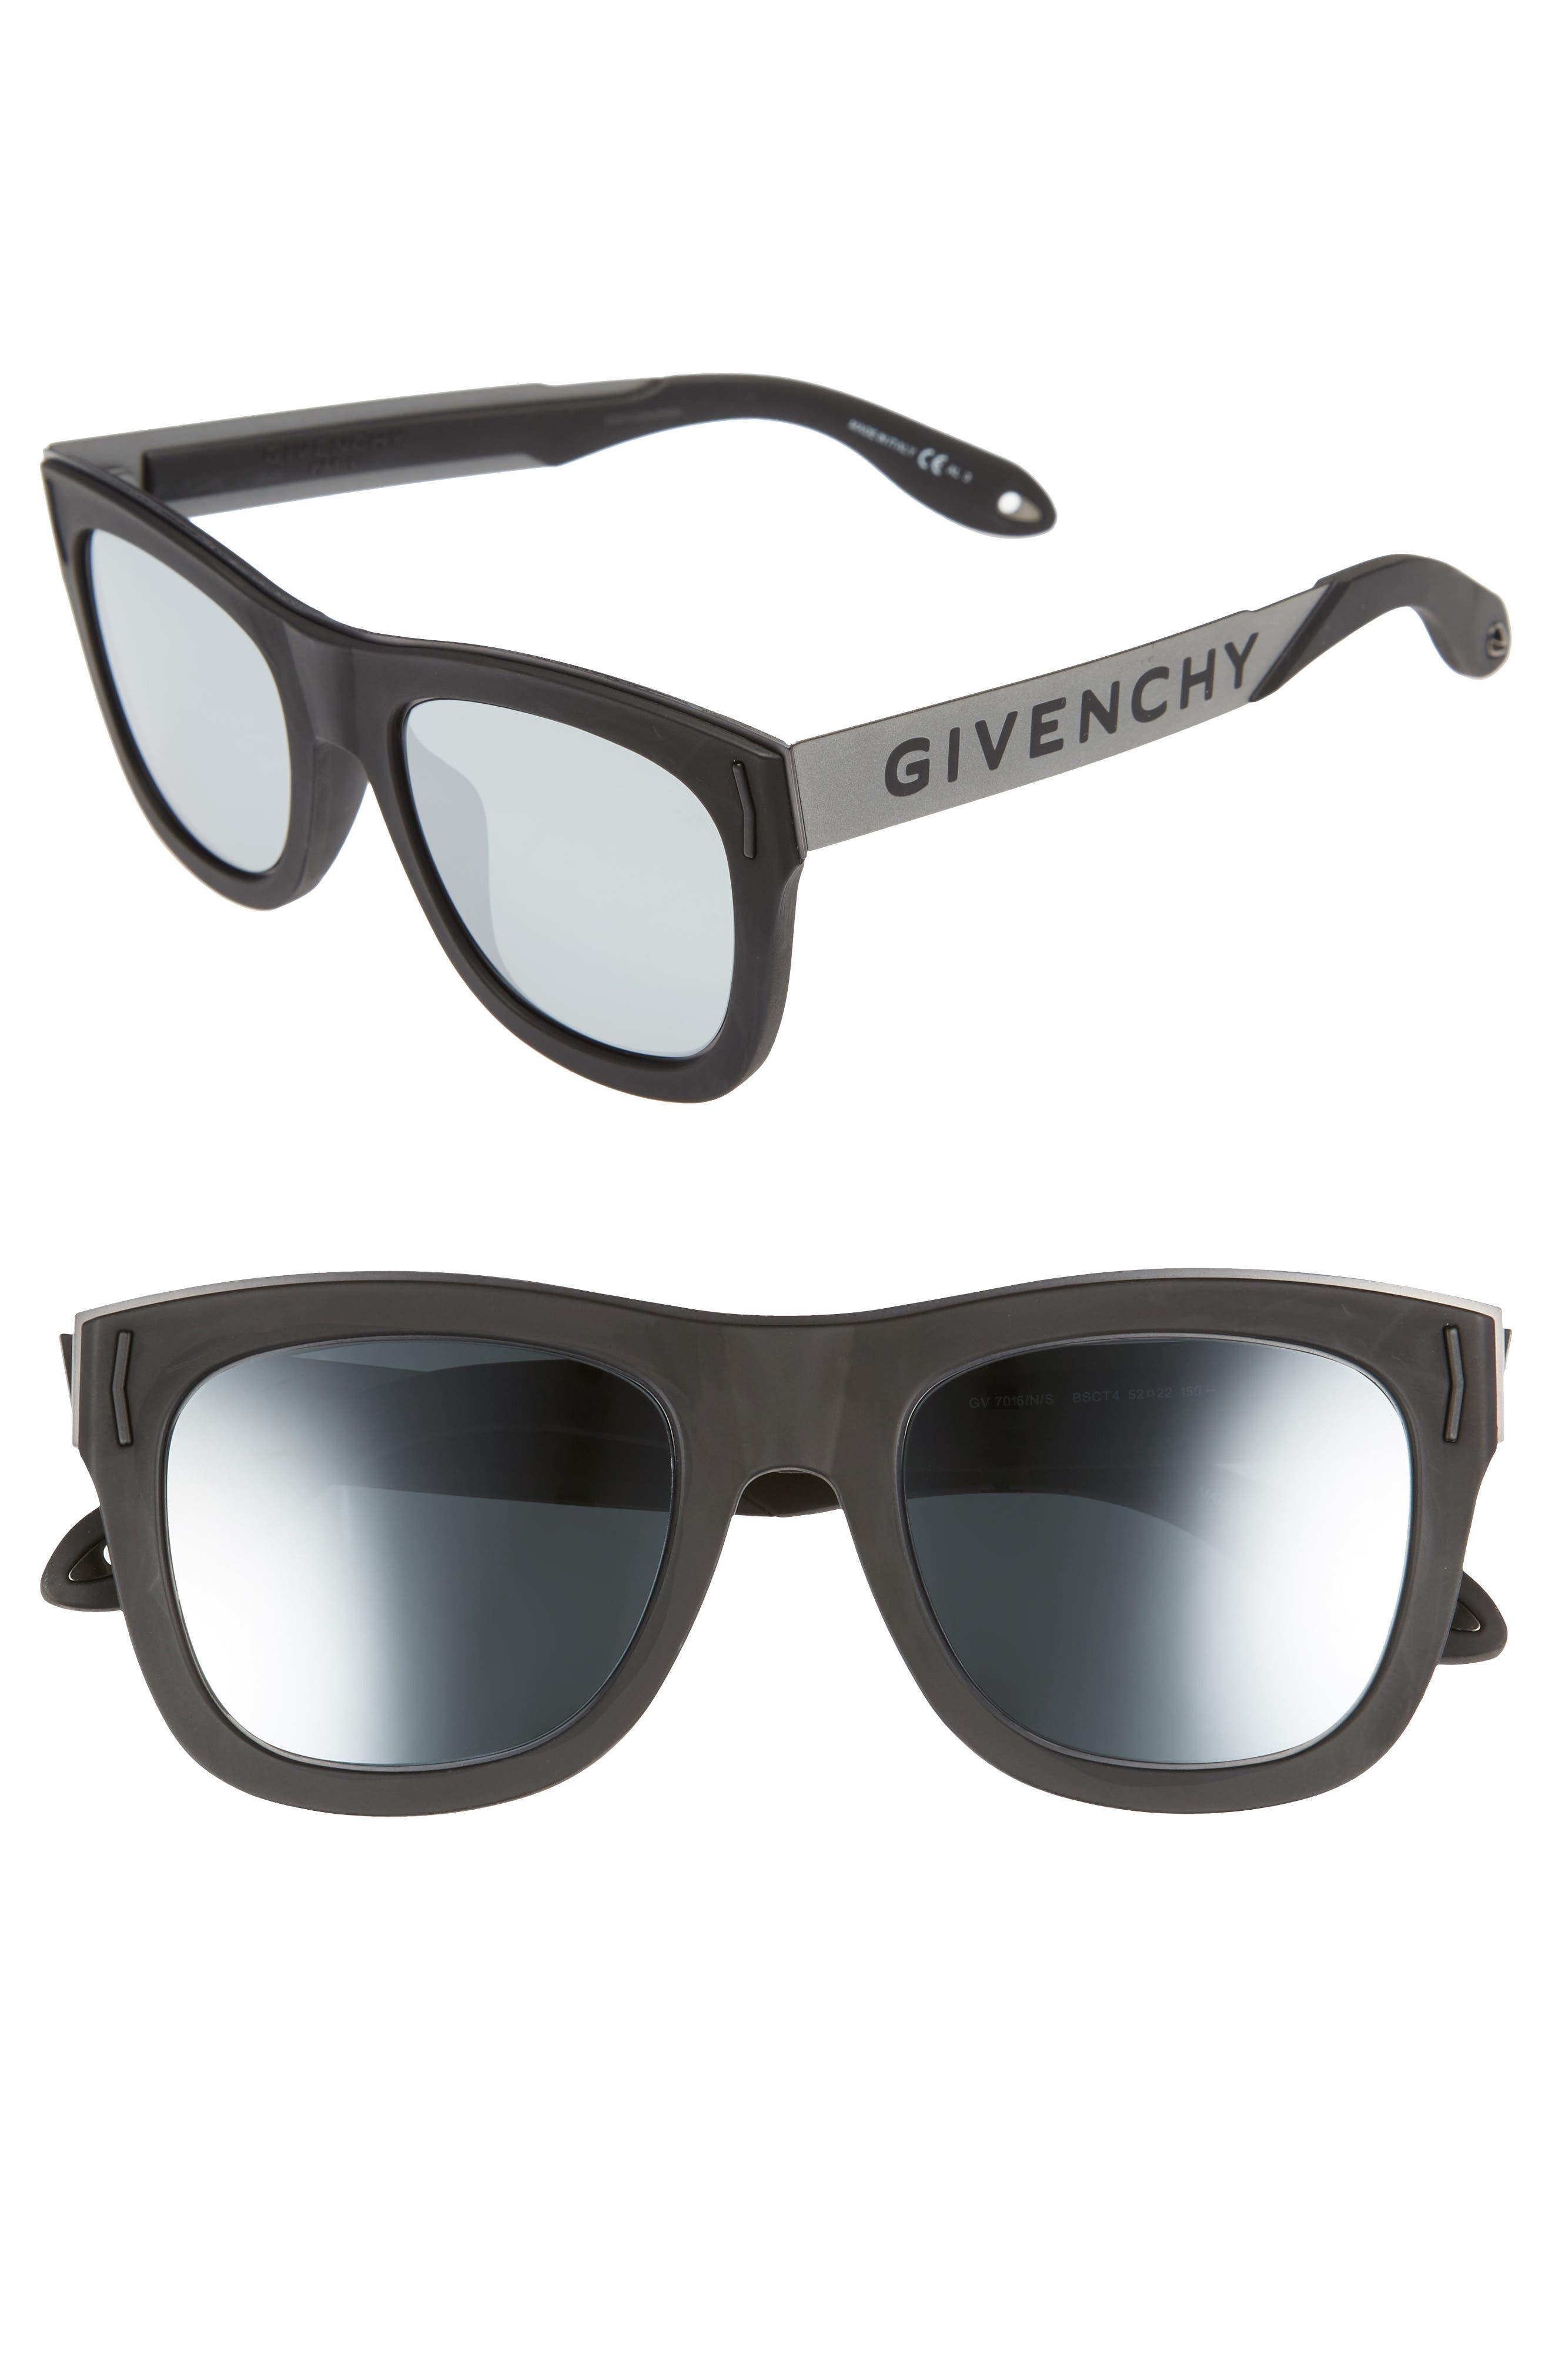 52mm Mirrored Rectangular Sunglasses,                         Main,                         color, Black/ Silver